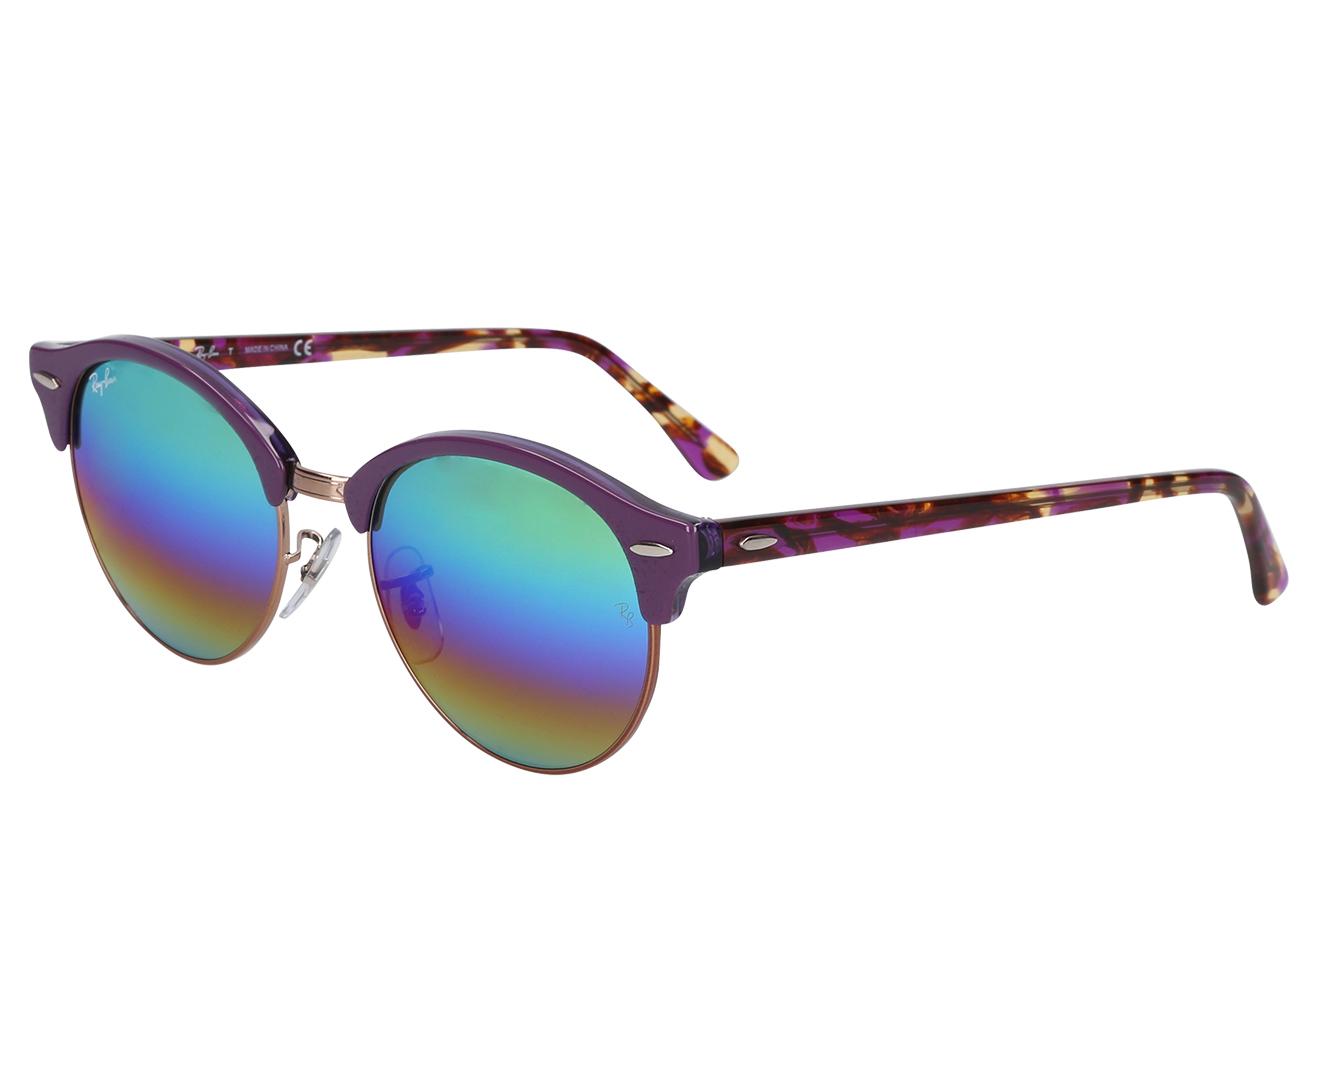 aba4a1216 Ray-Ban Men's Clubround RB4246 Sunglasses - Violet/Light Grey | Catch.com.au